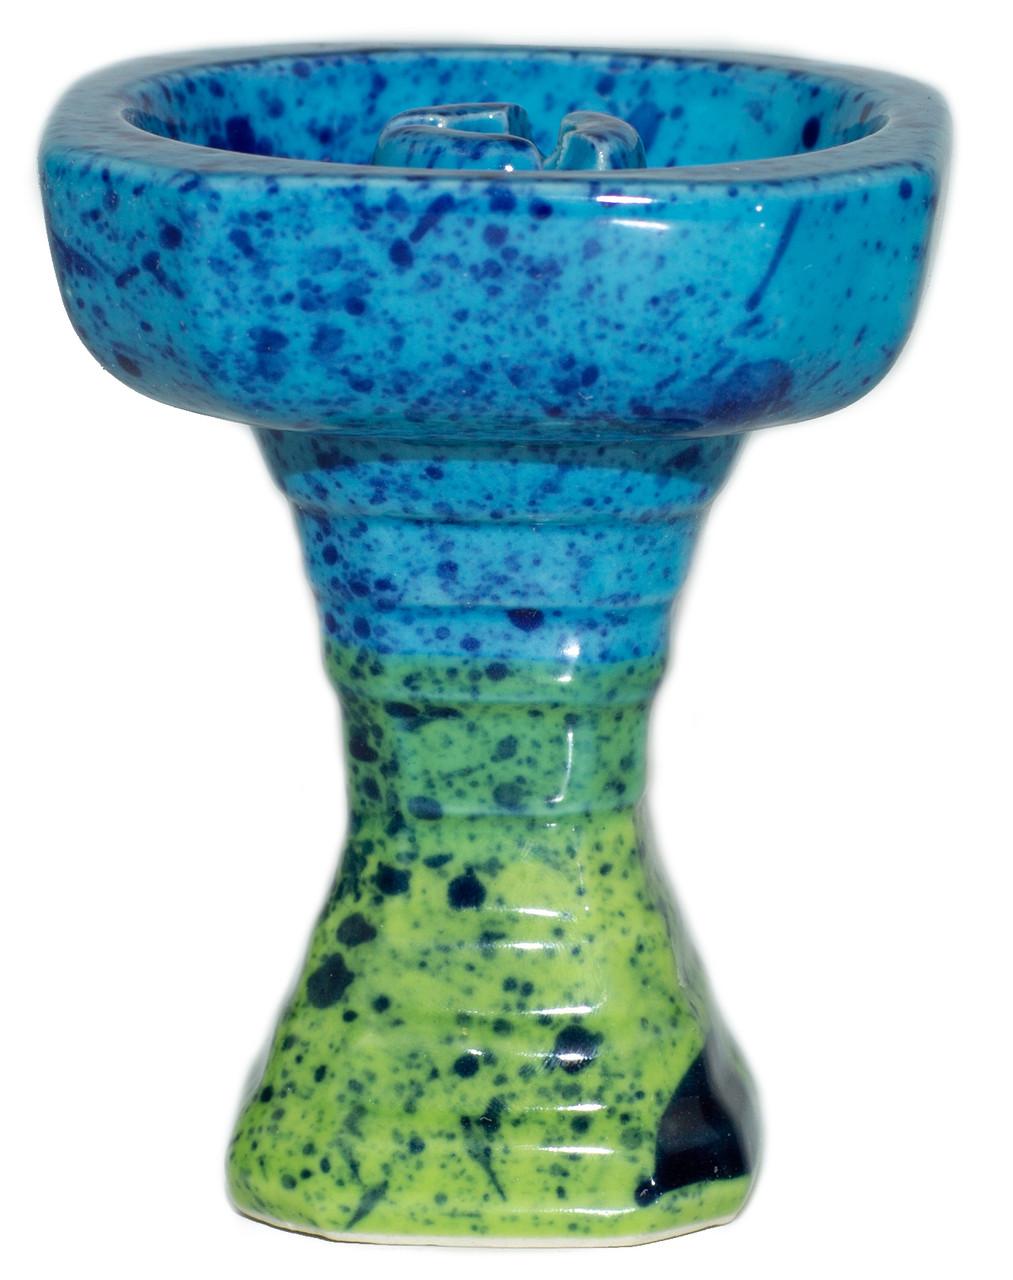 Чаша Grynbowls Hexahedron Голубой - Салатовый